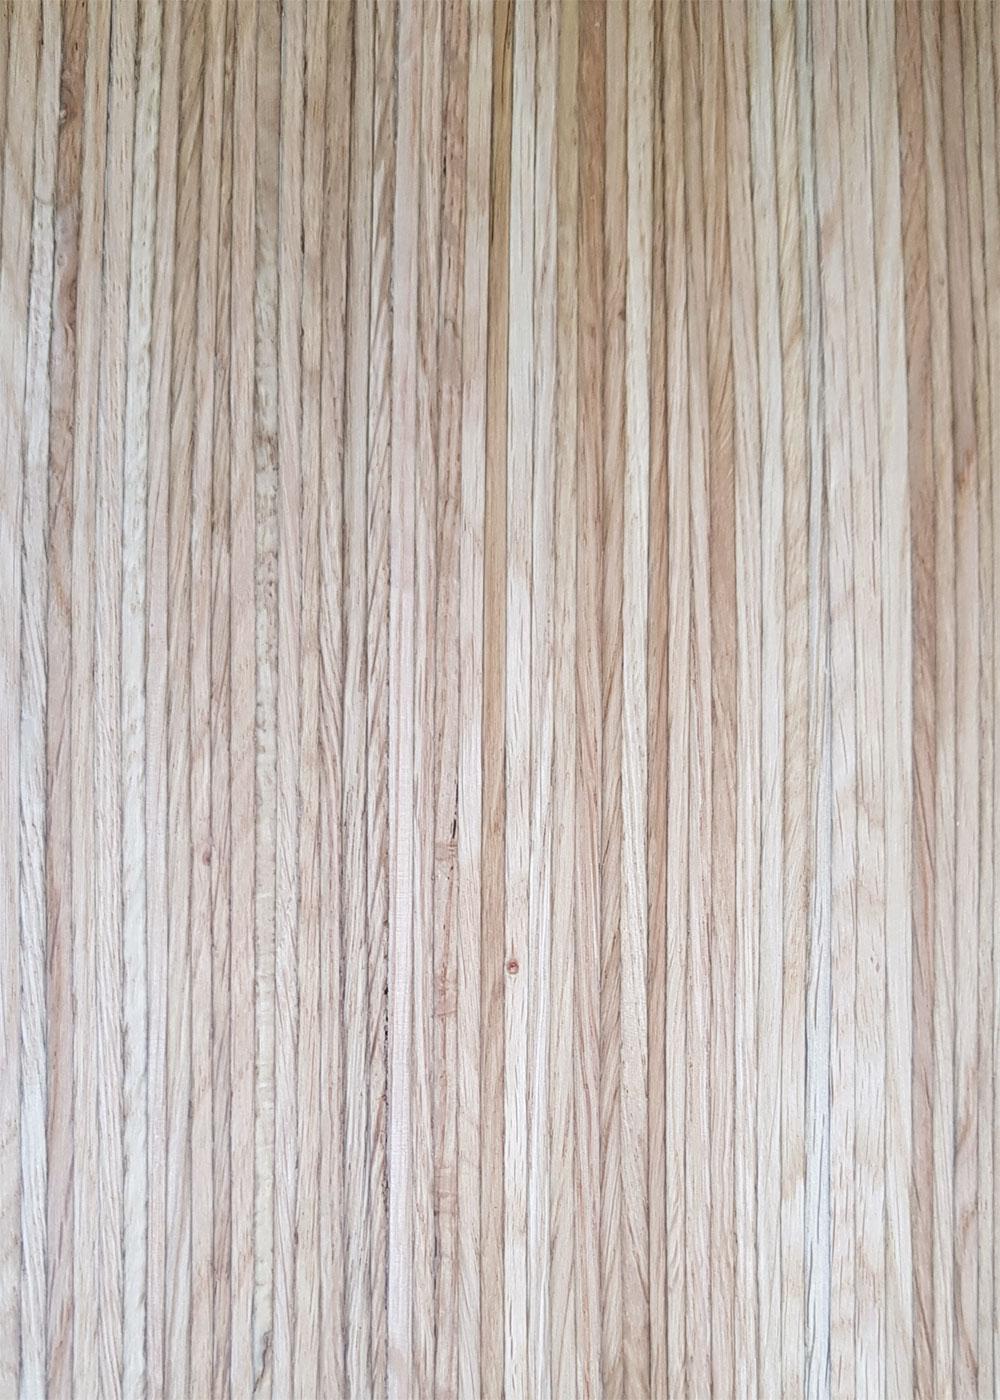 oak-bamboo